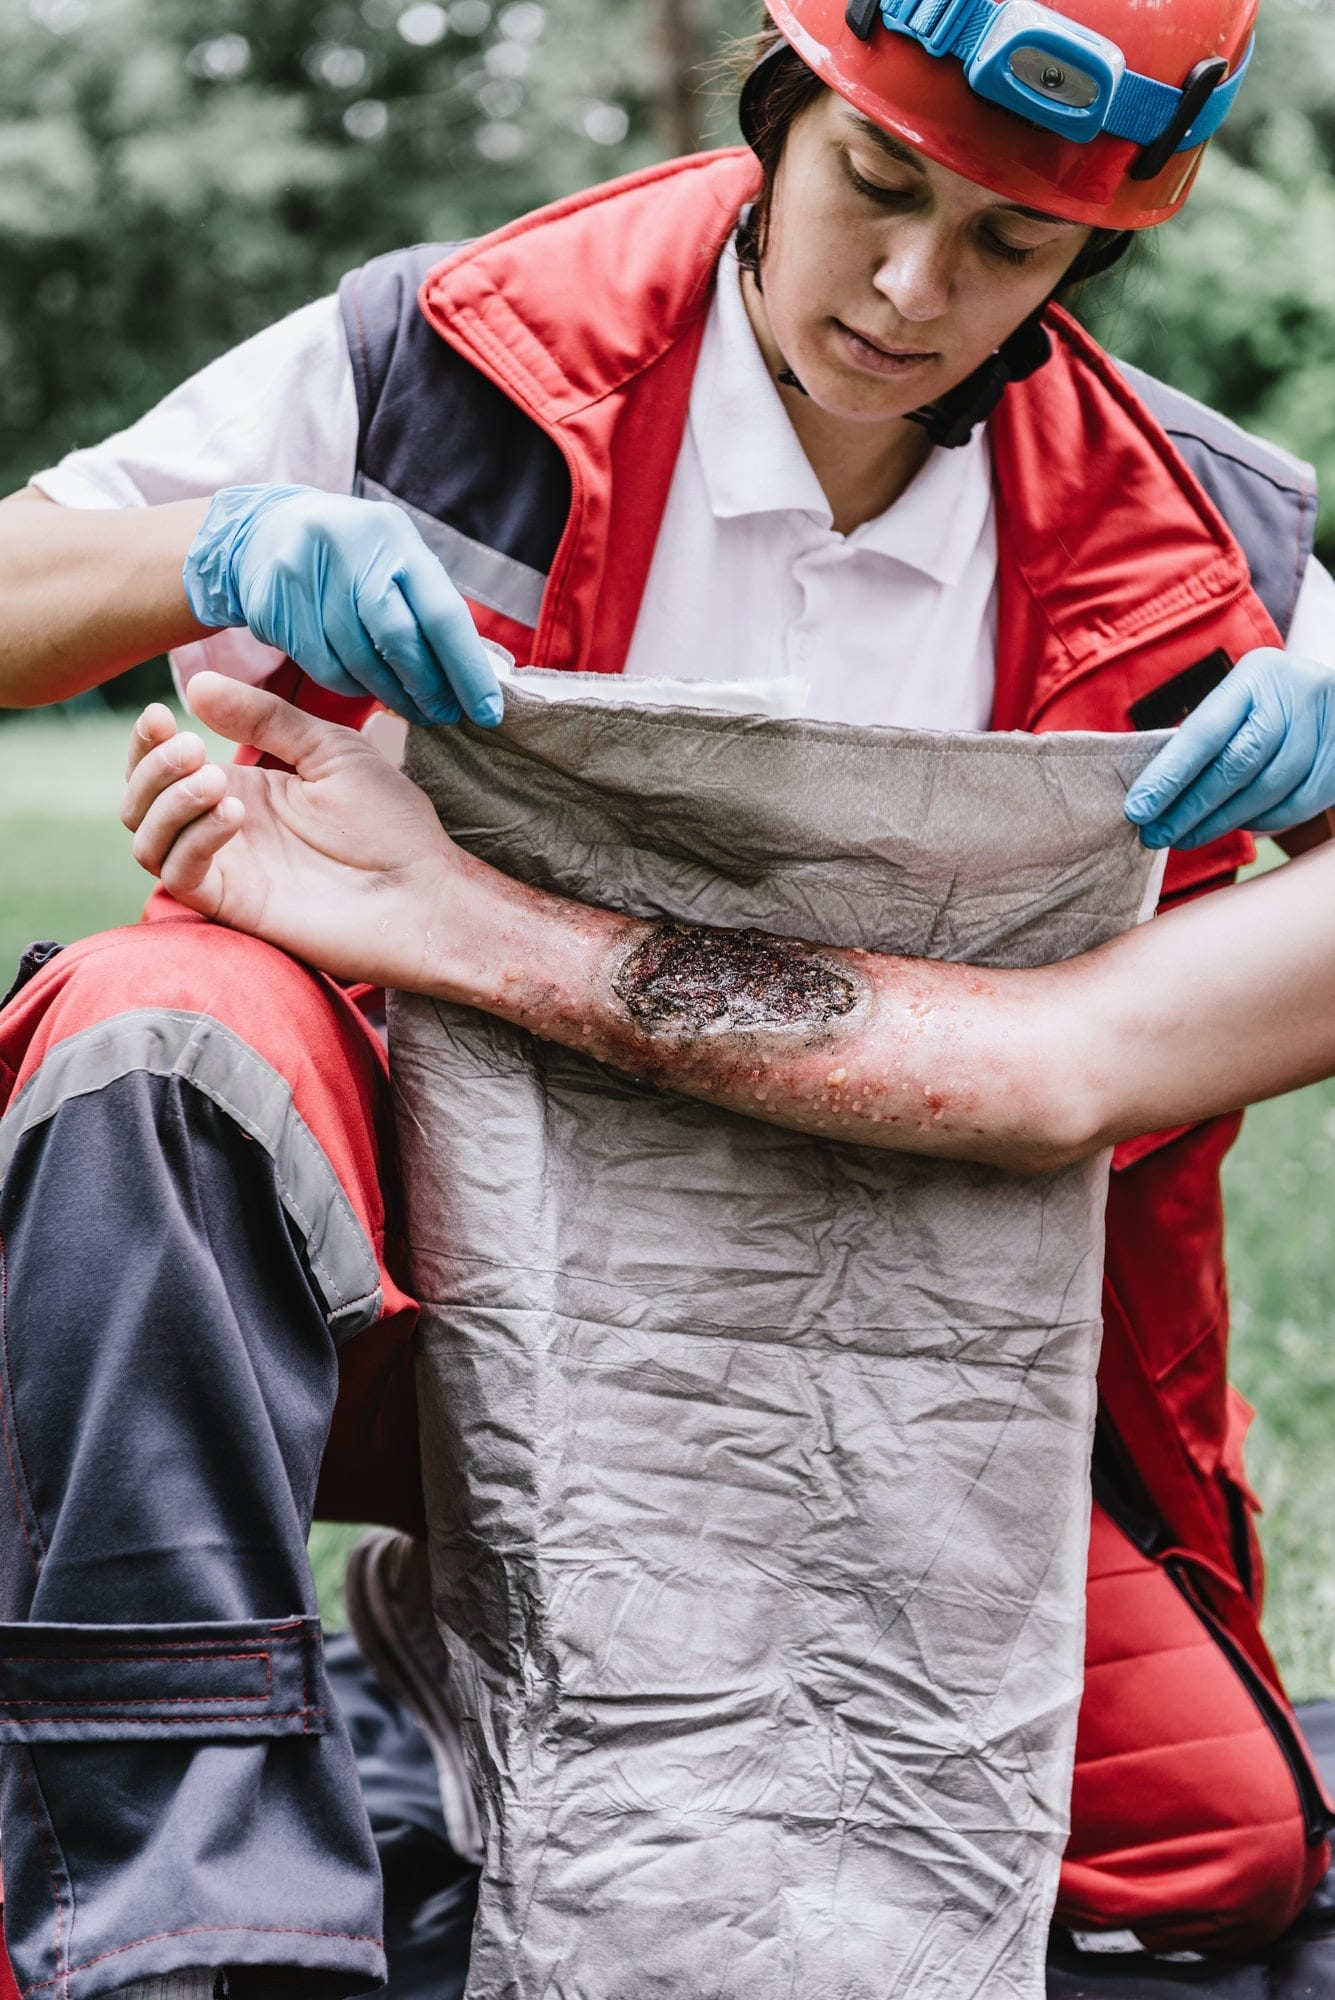 Injury Prevention and Ergonomics